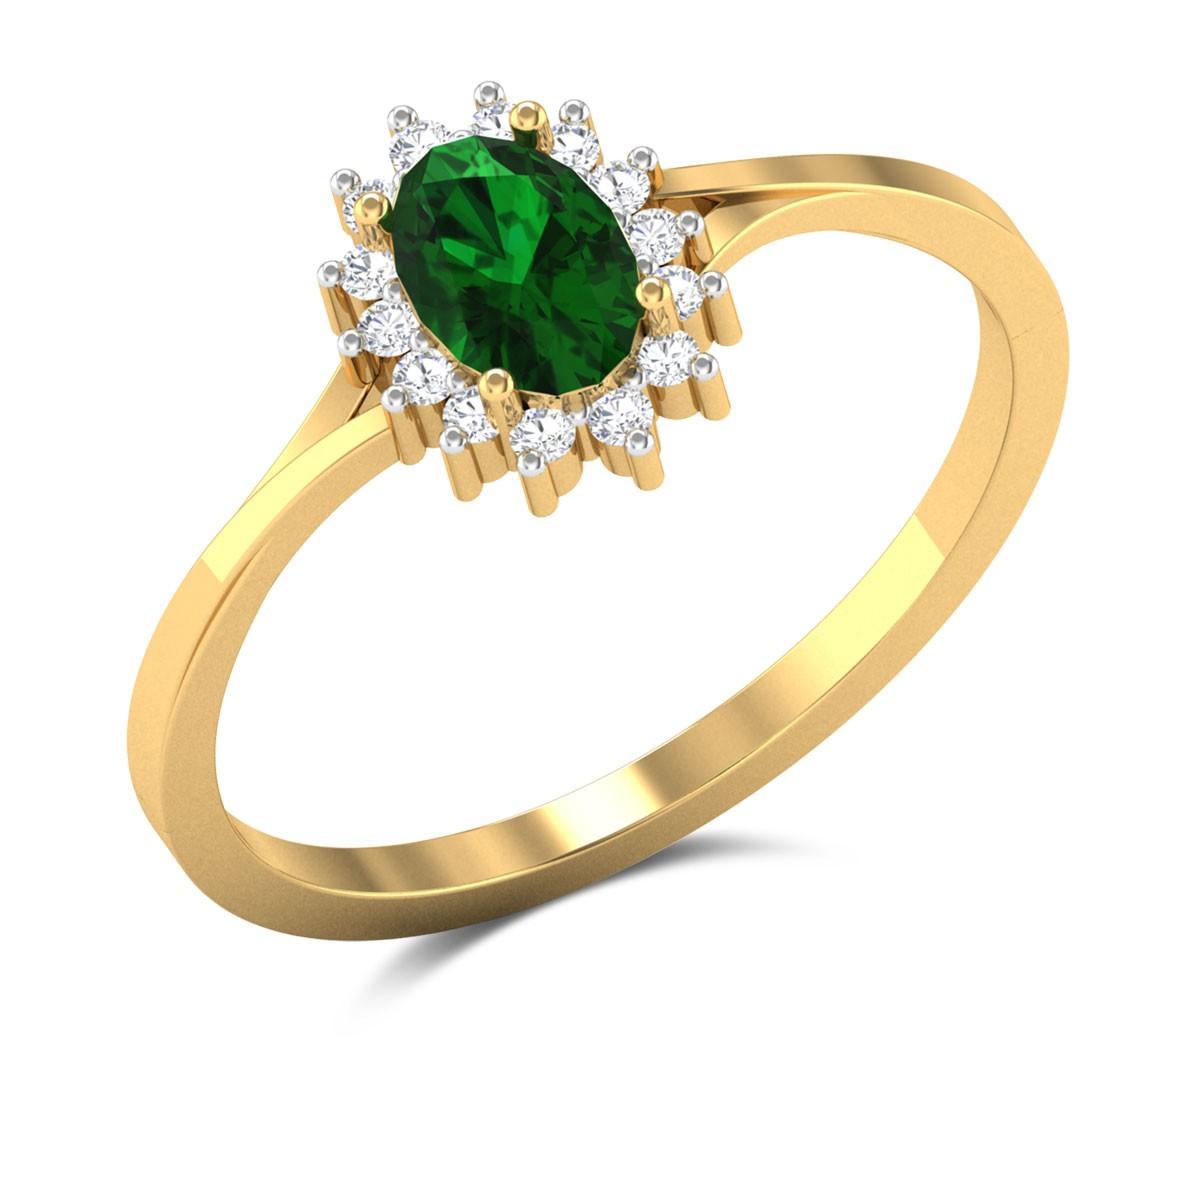 Gentle Joy Diamond Ring